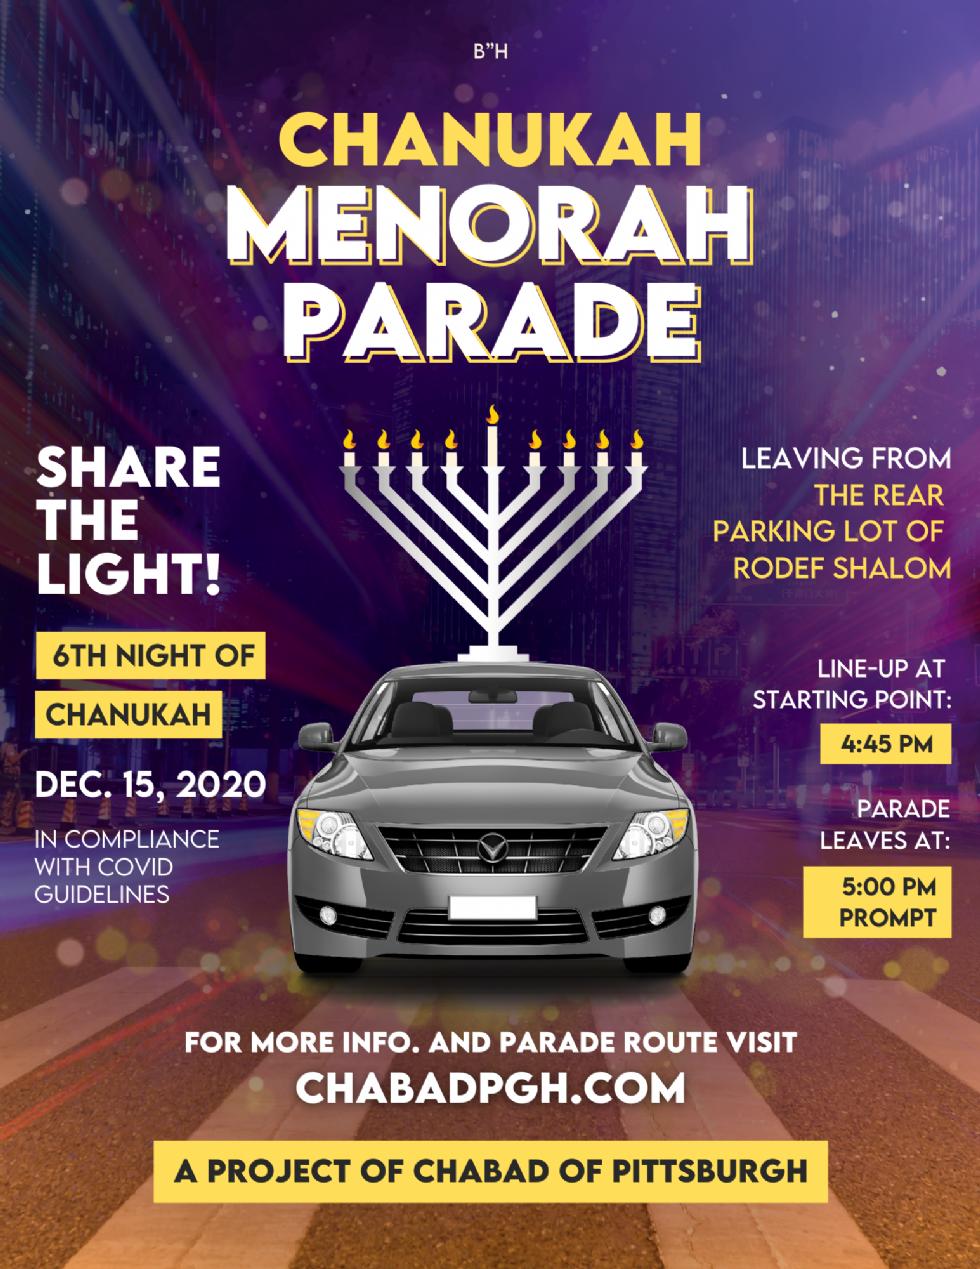 Chanukah Menorah Parade.png